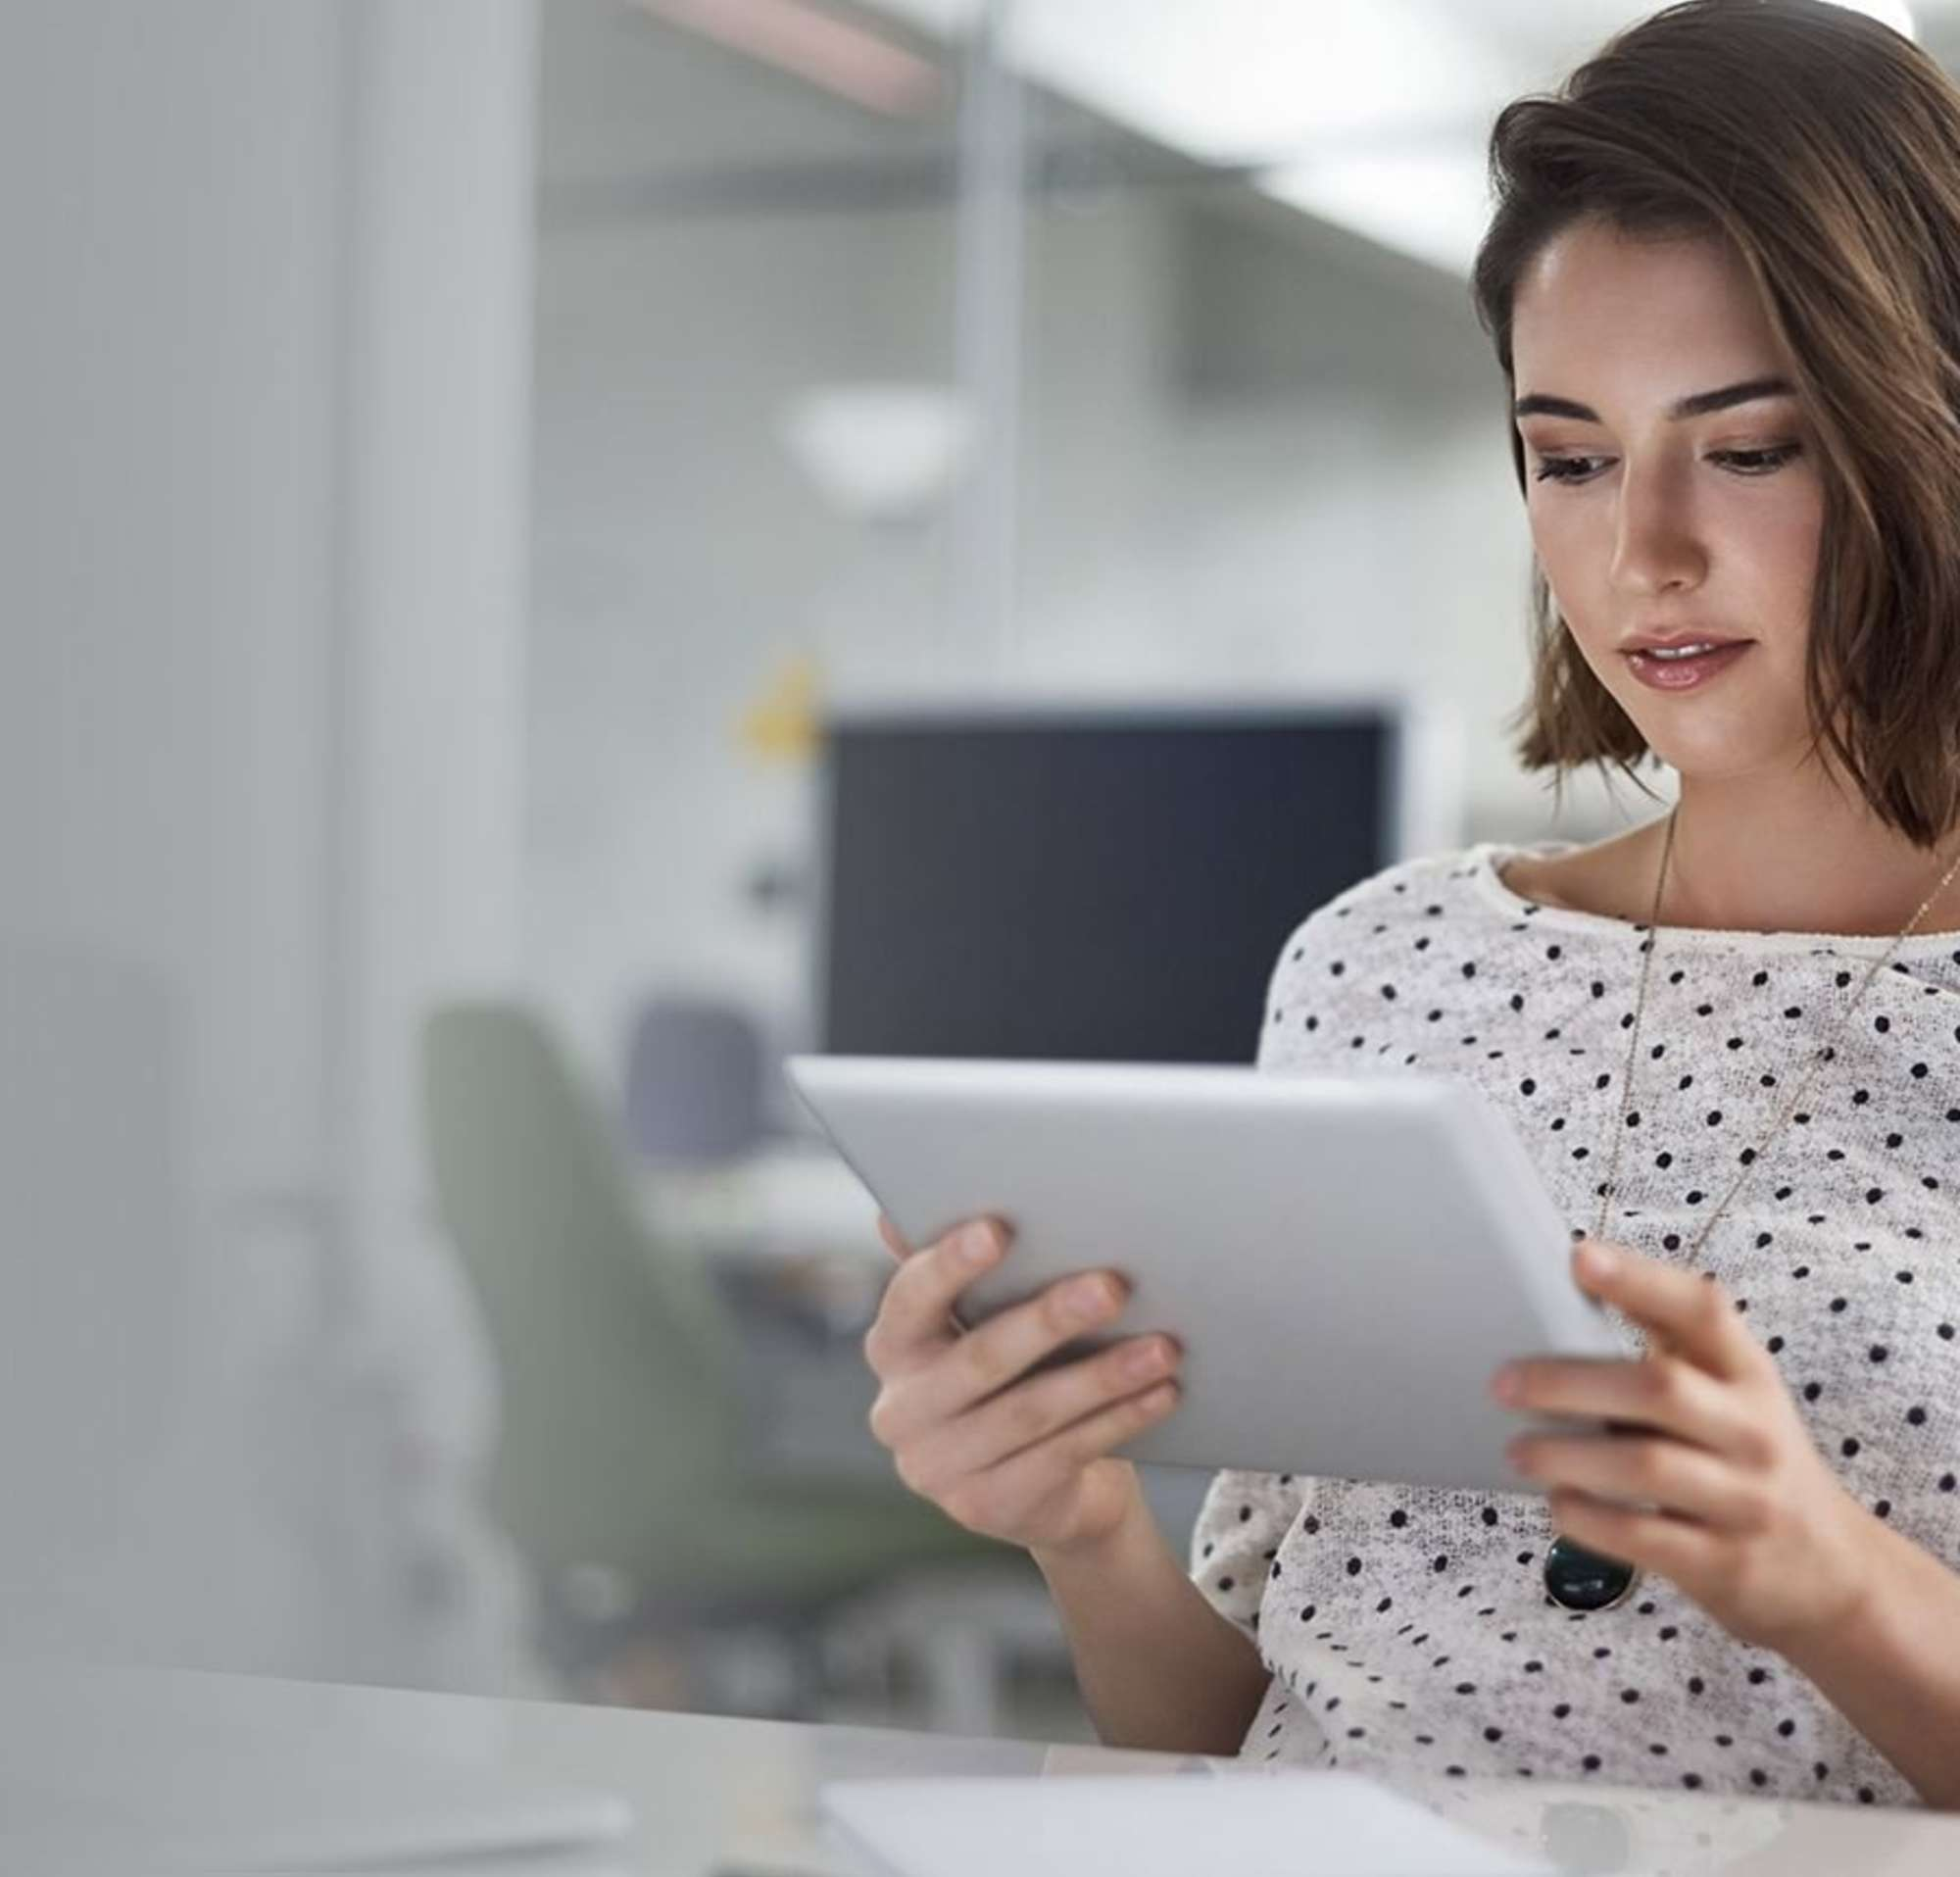 Un femme leer une papel en une office